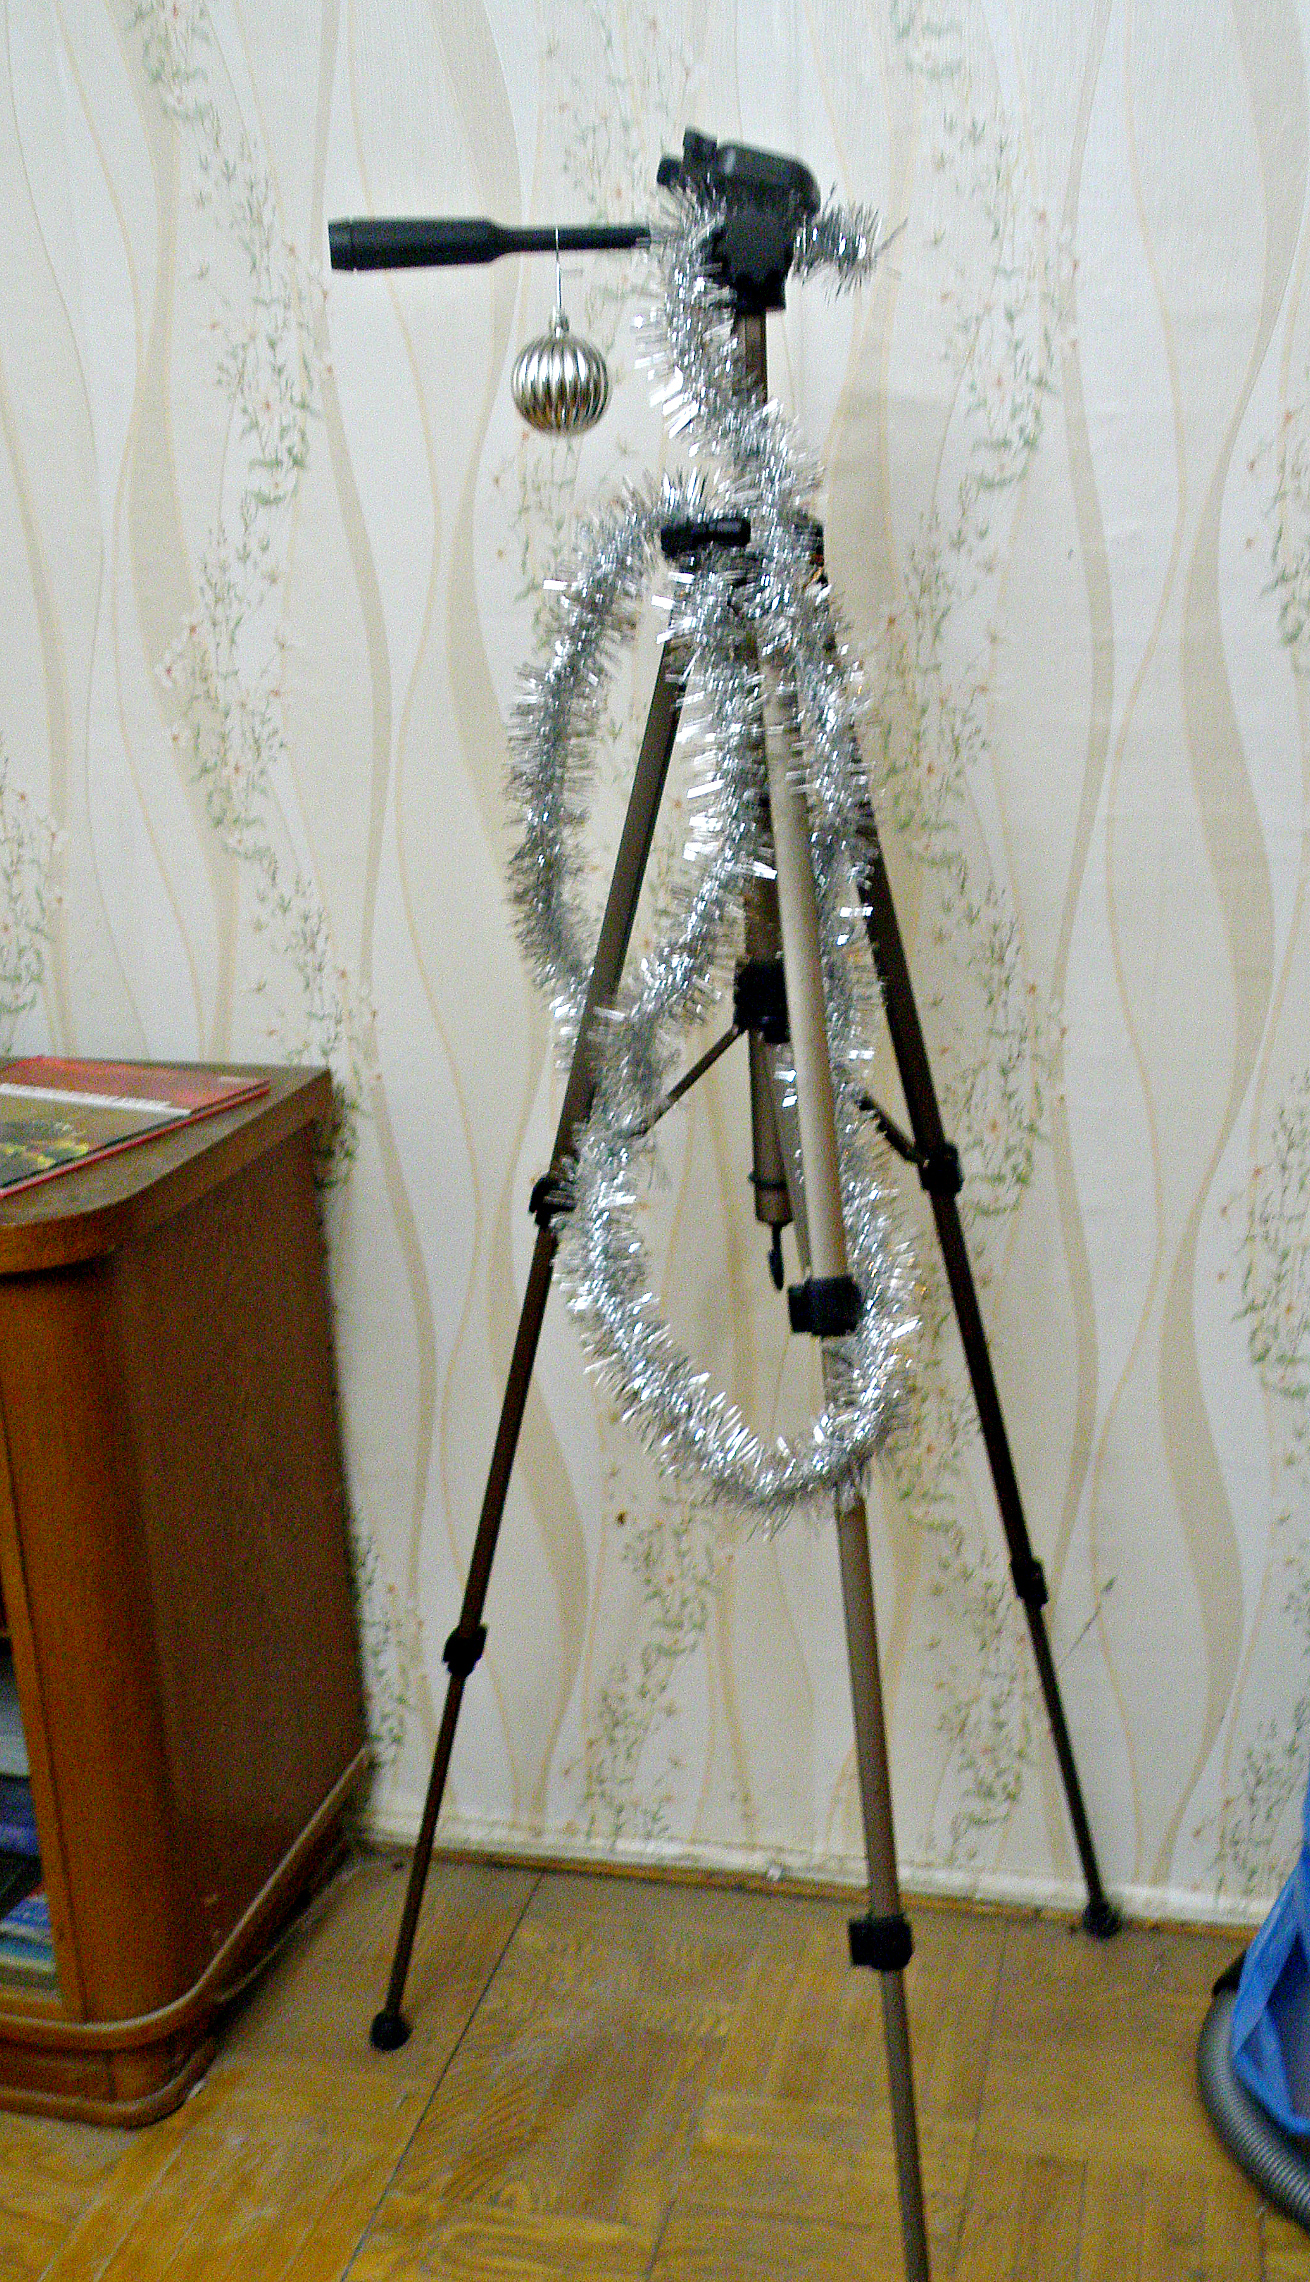 1. Настоящая ёлка фотографа. :)